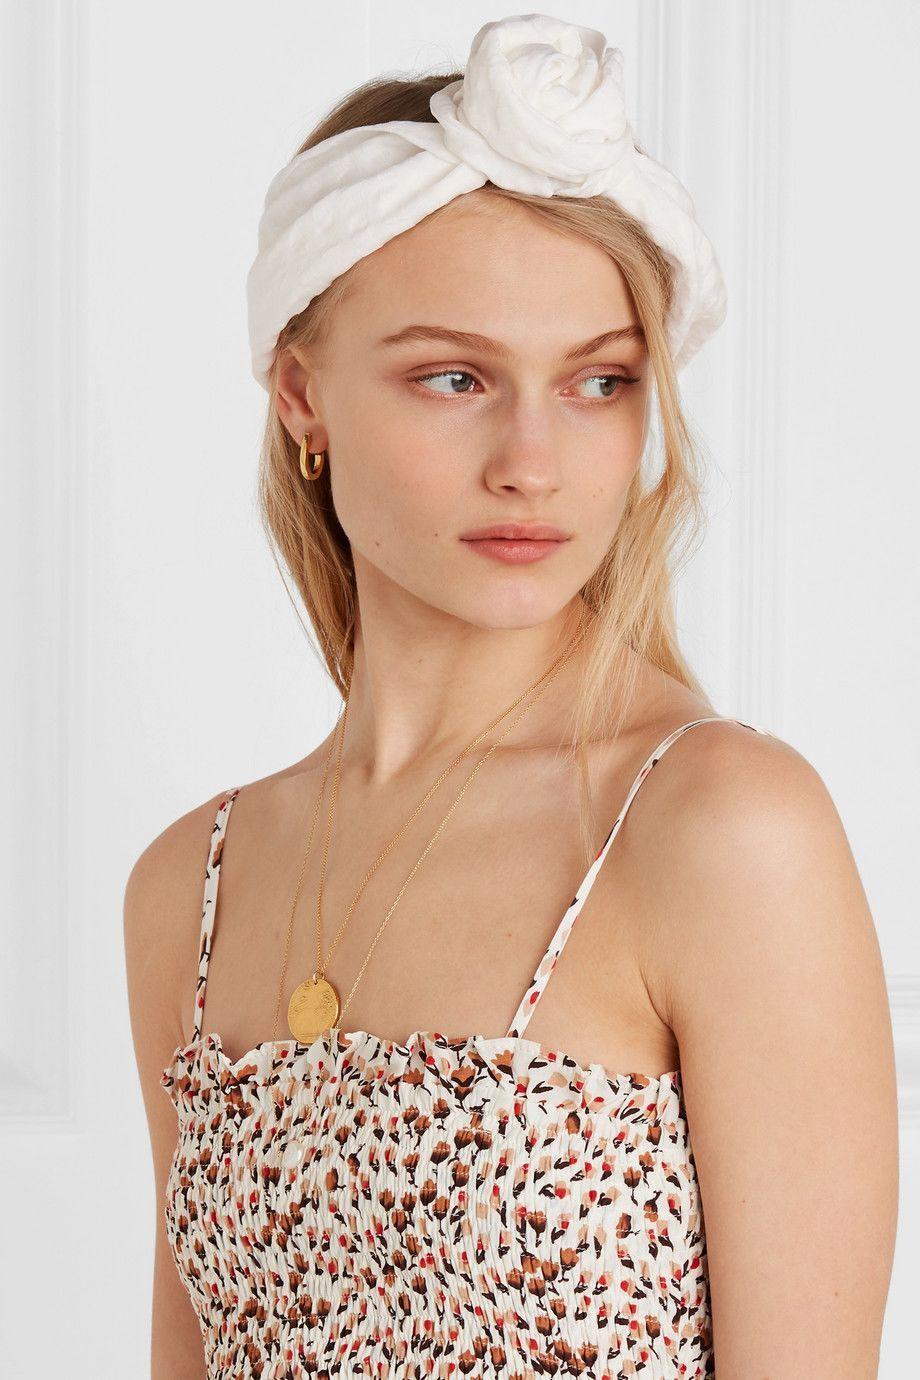 Dari Kasual hingga Elegan, Ini Model Turban Terbaru yang Lagi Booming